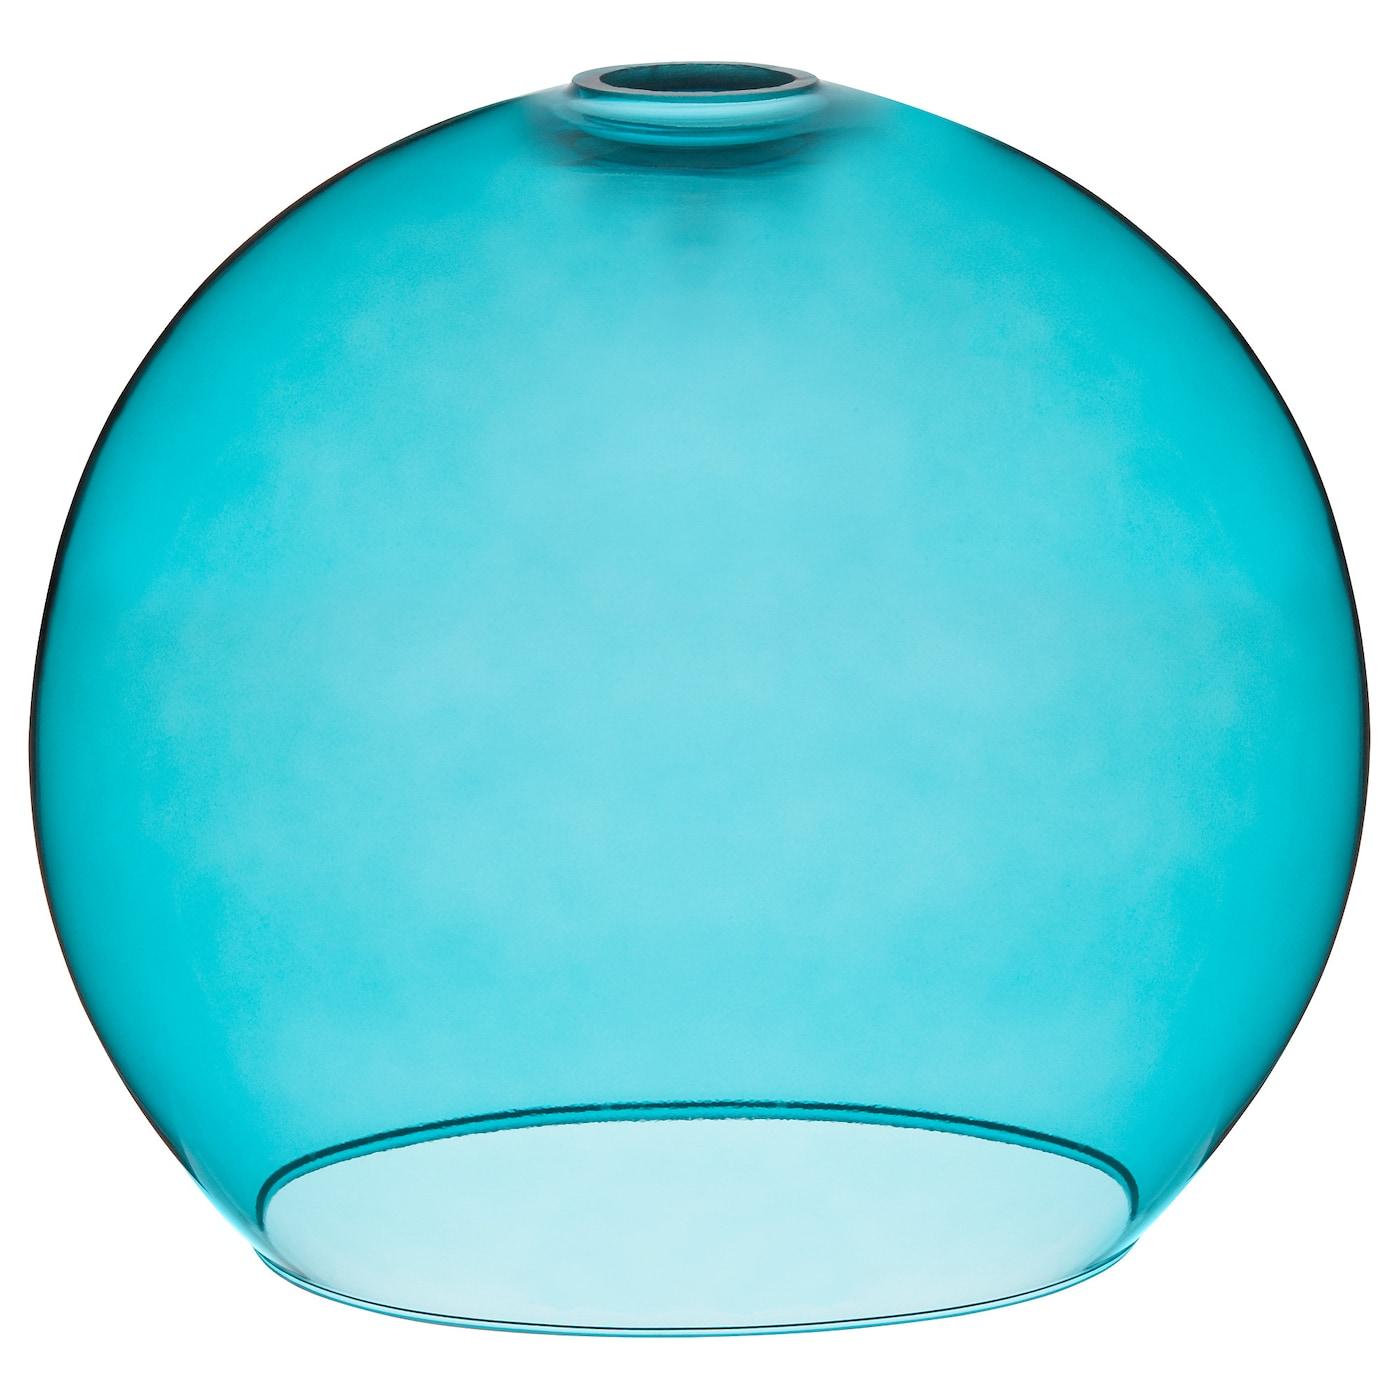 jakobsbyn pendant lamp shade turquoise ikea. Black Bedroom Furniture Sets. Home Design Ideas